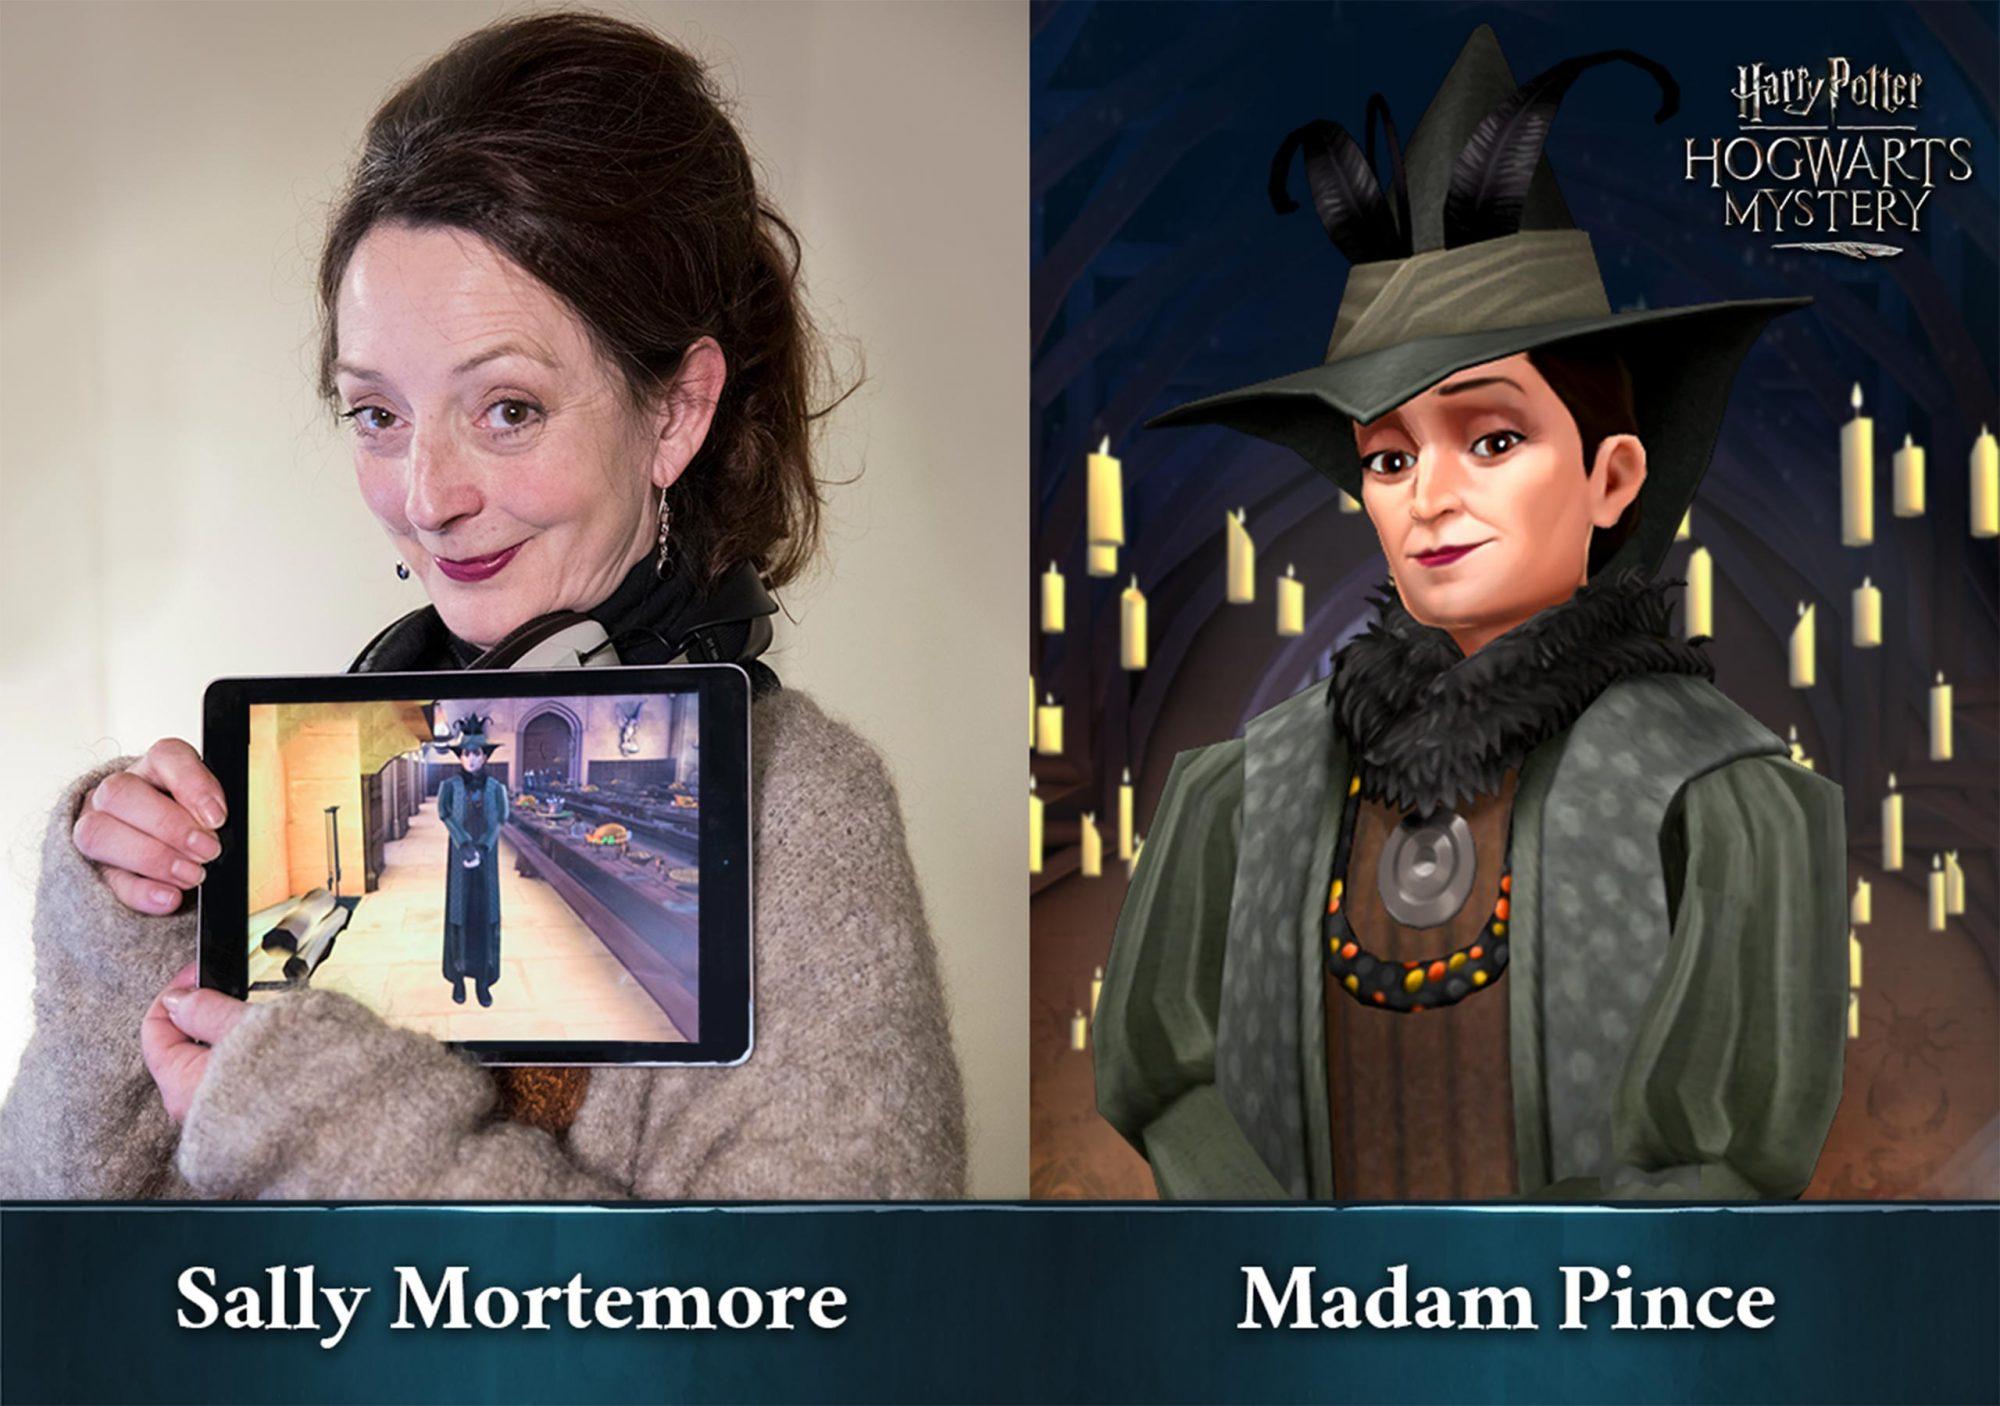 HP_Press_SallyMortemore_MadamPince_02